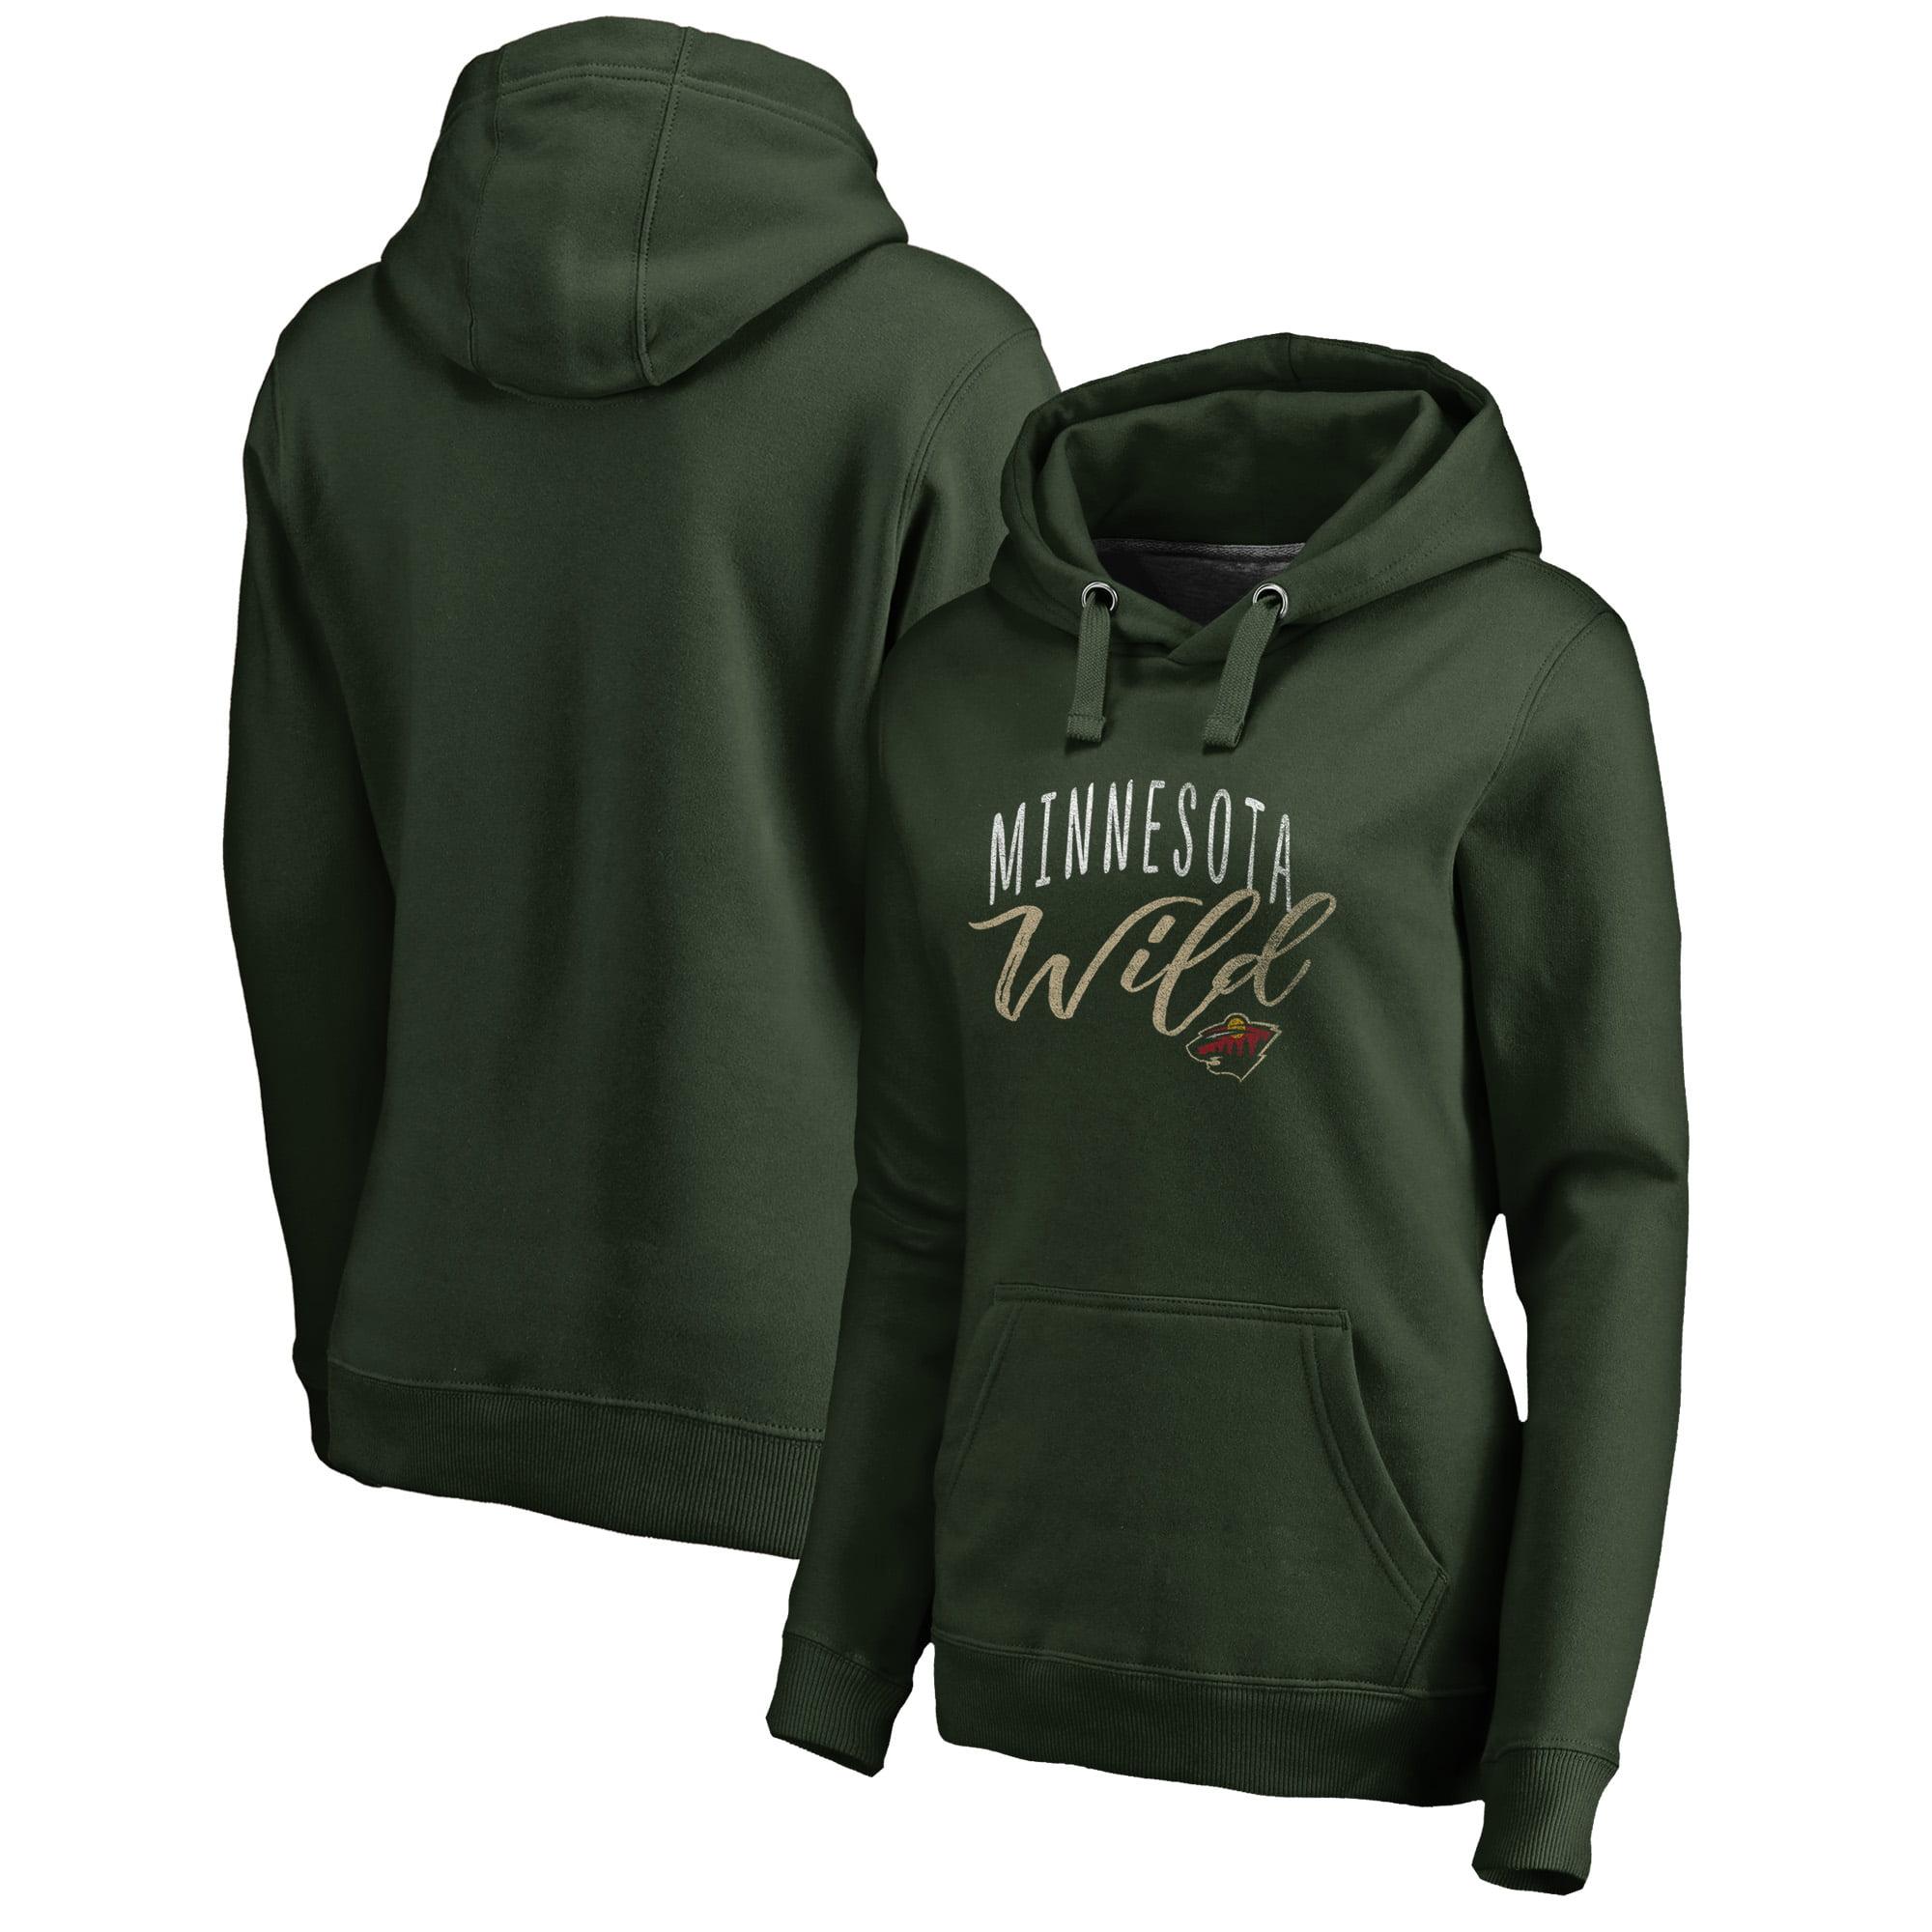 Minnesota Wild Fanatics Branded Women's Plus Size Graceful Pullover Hoodie - Green